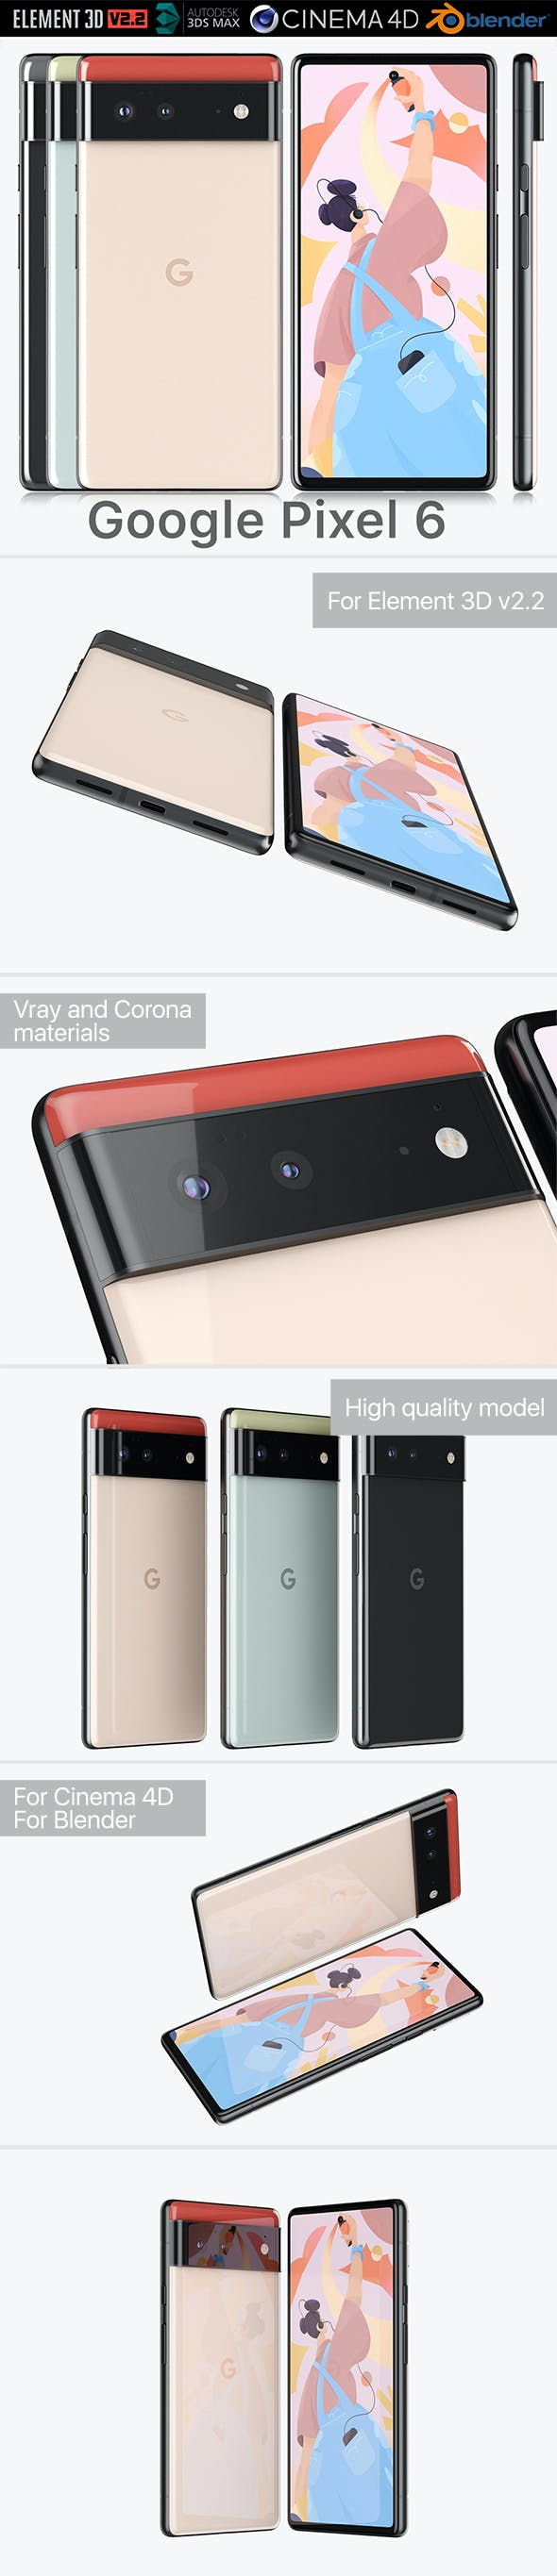 Google Pixel 6 all colors - 3DOcean Item for Sale